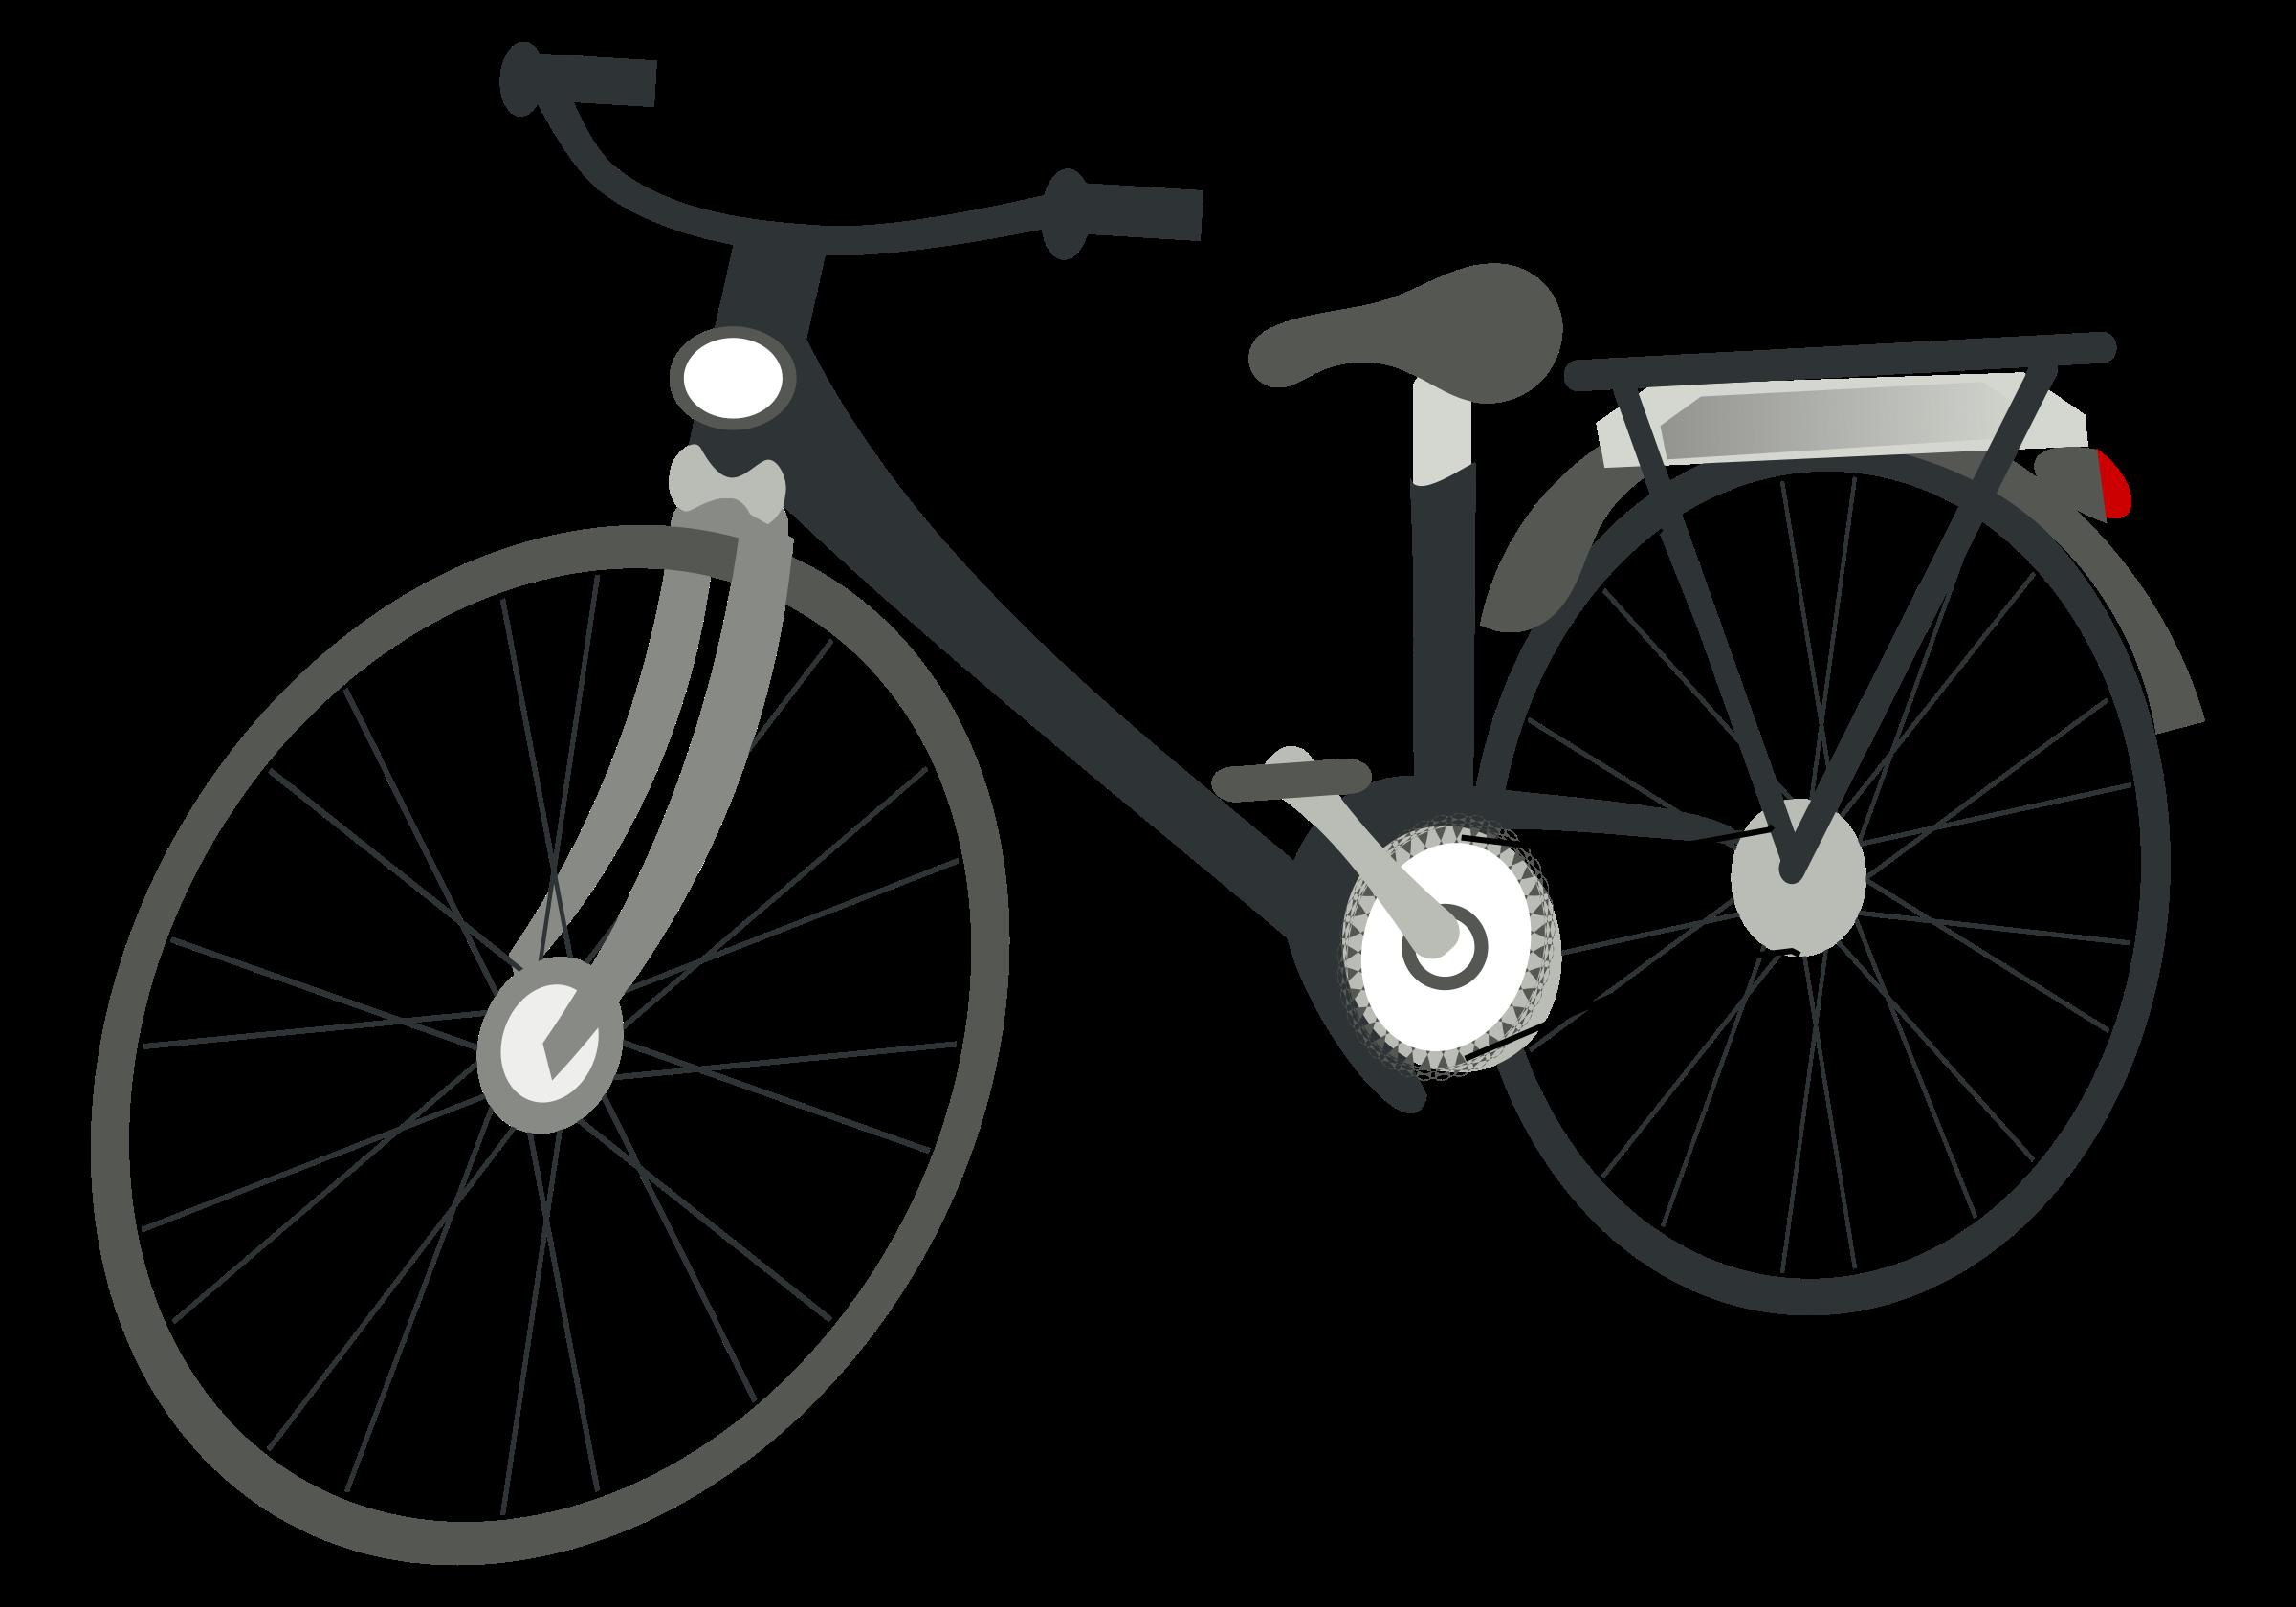 Holland e bike icons. Clipart road frame